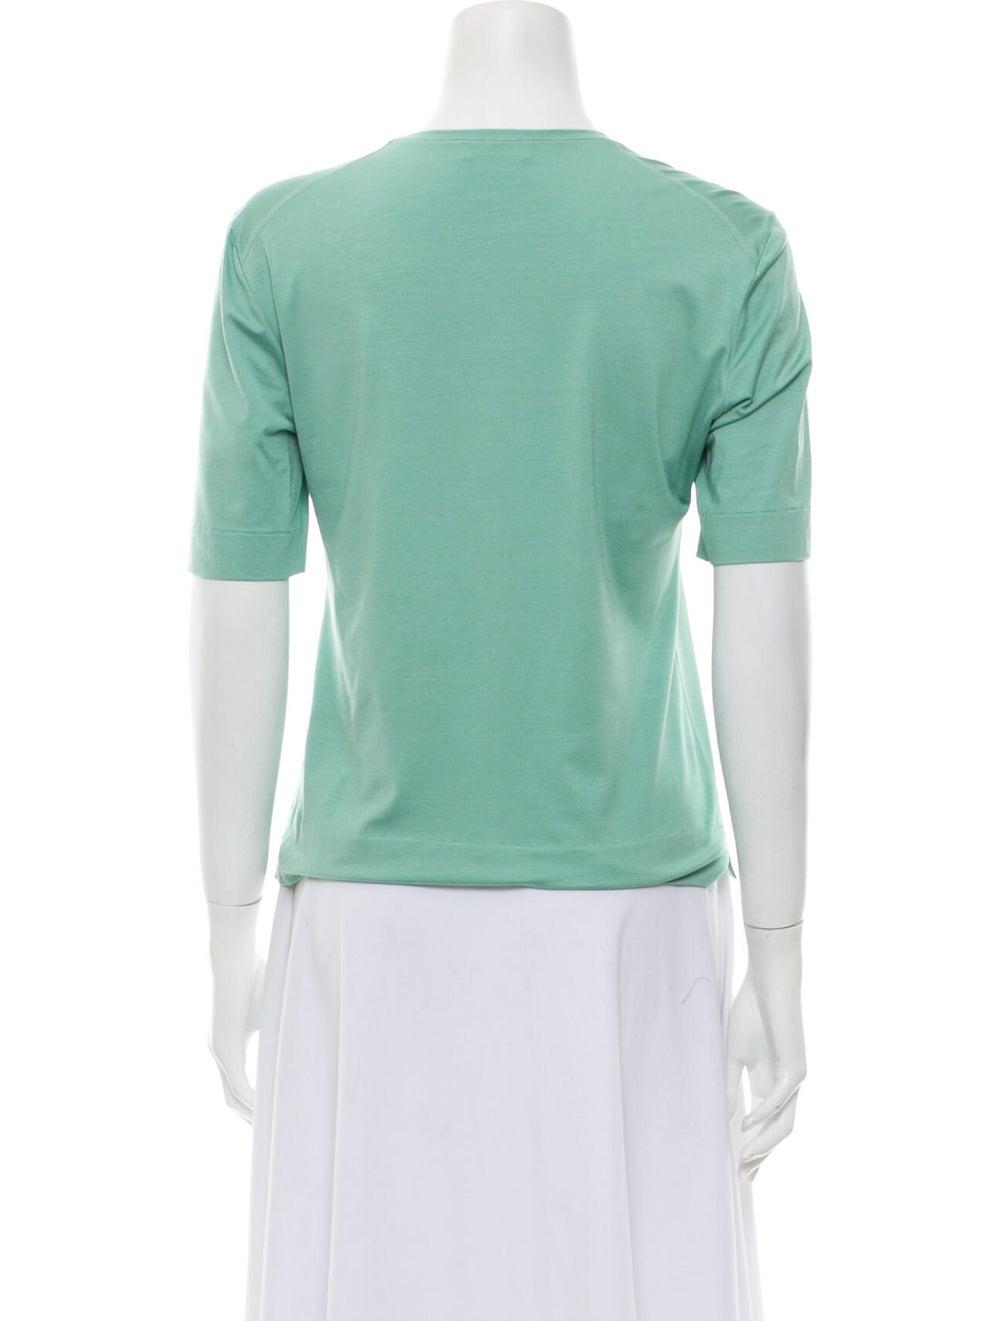 Brioni Silk Scoop Neck T-Shirt Green - image 3